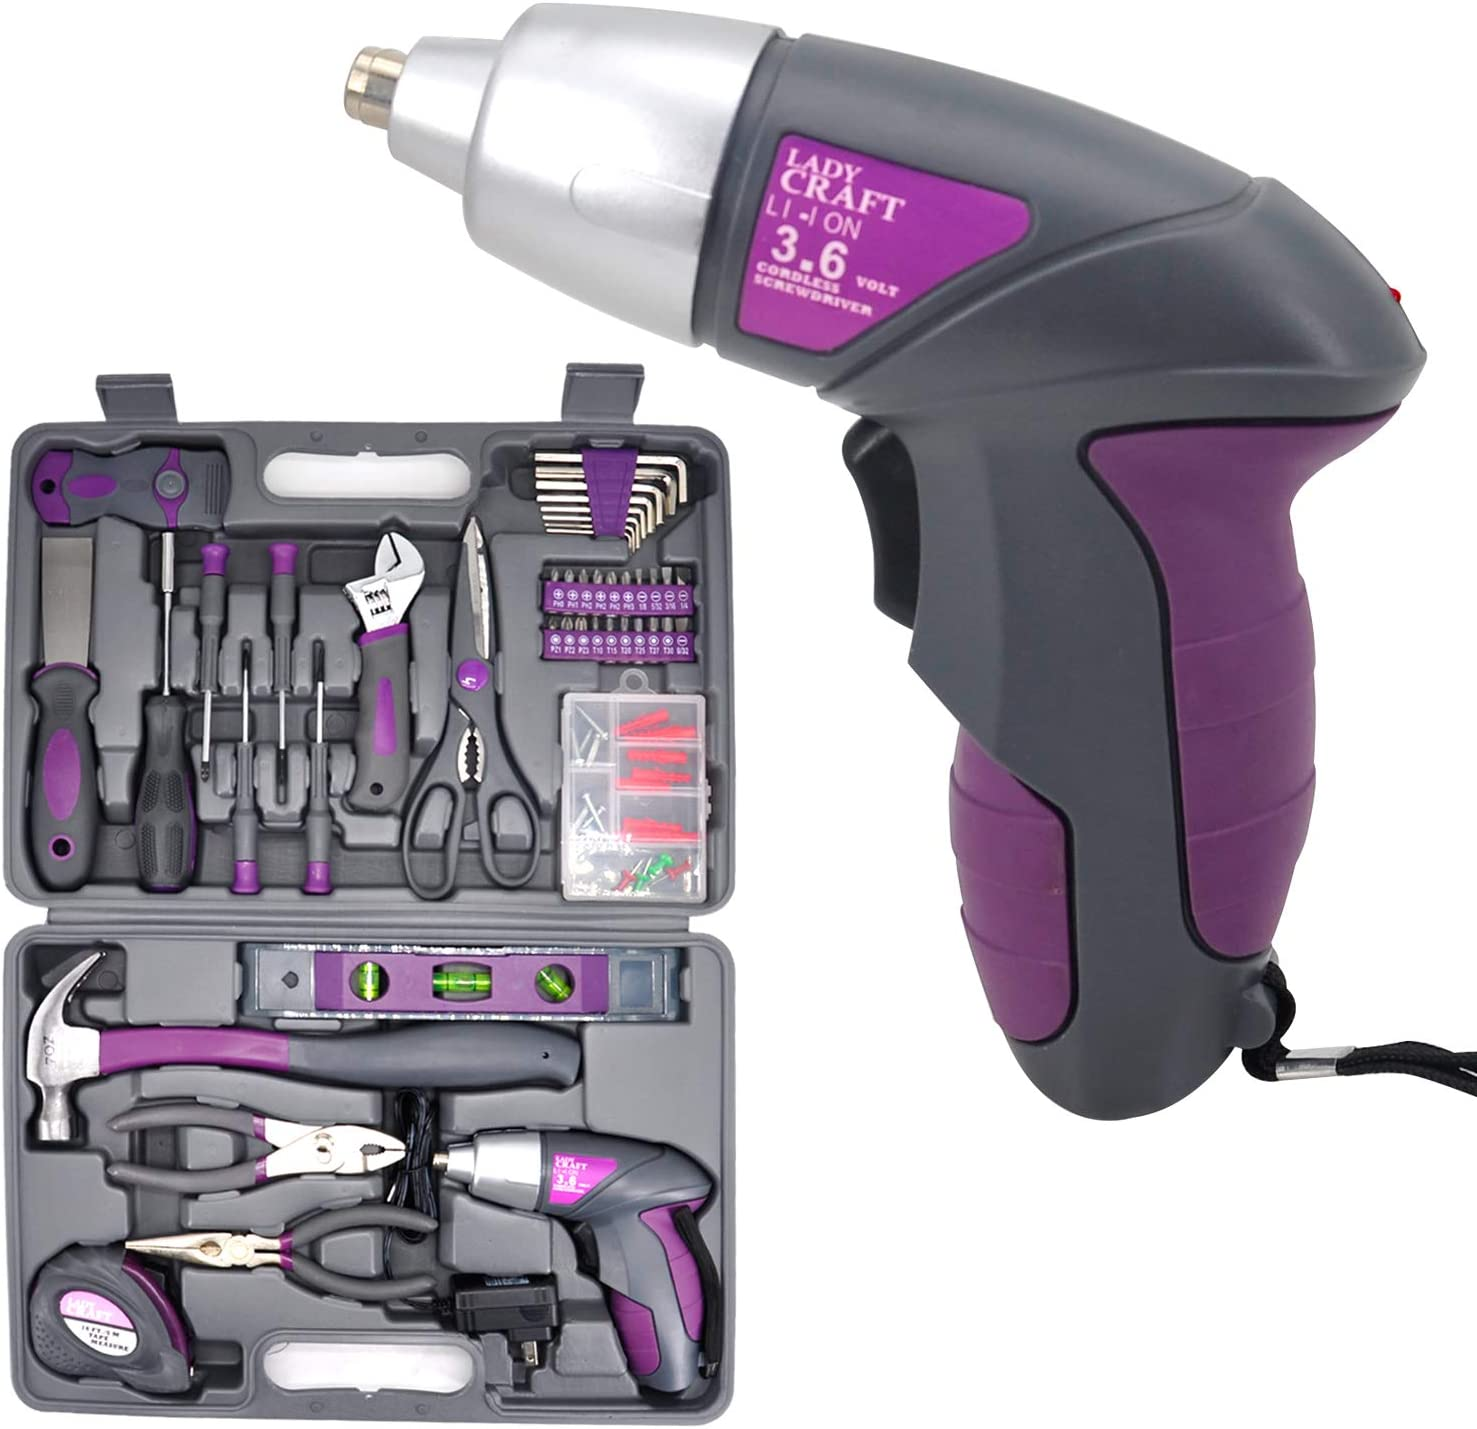 Uniteco 44-Piece Pink Tool Kit Set for Women with Storage Case